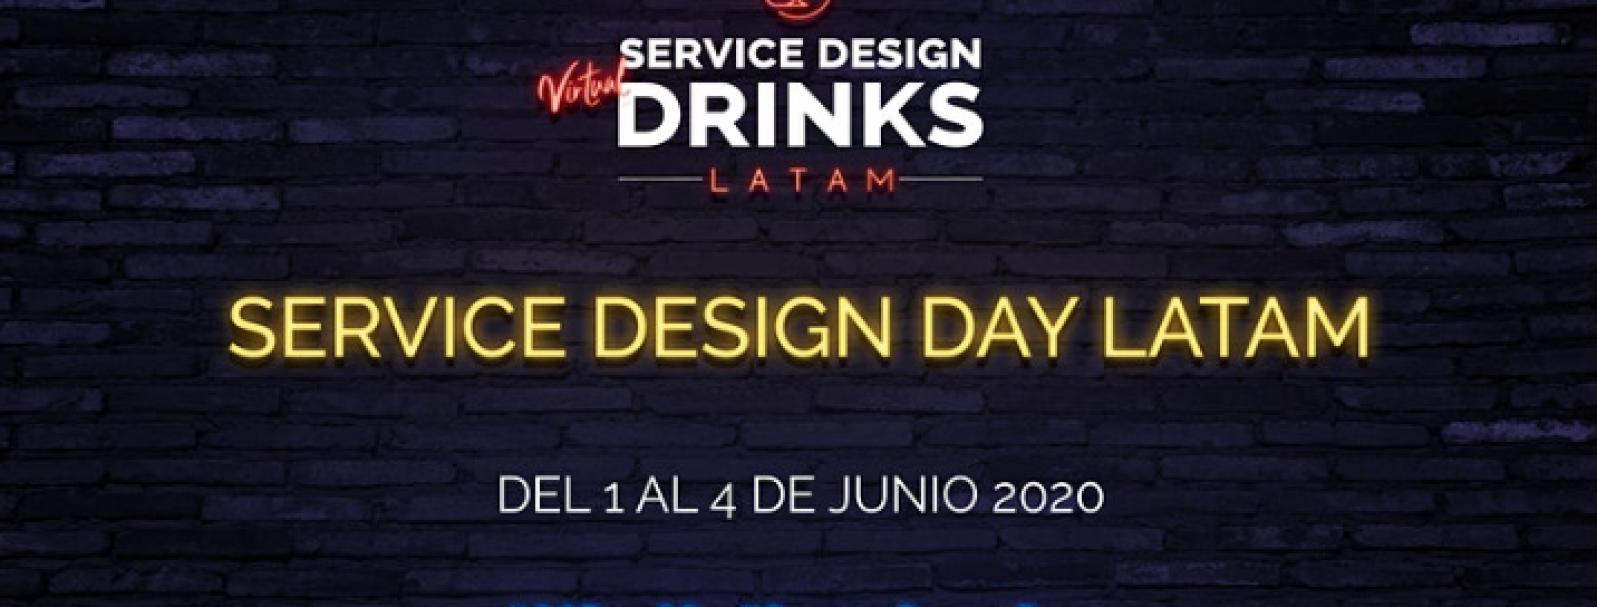 Service Design Drinks LATAM